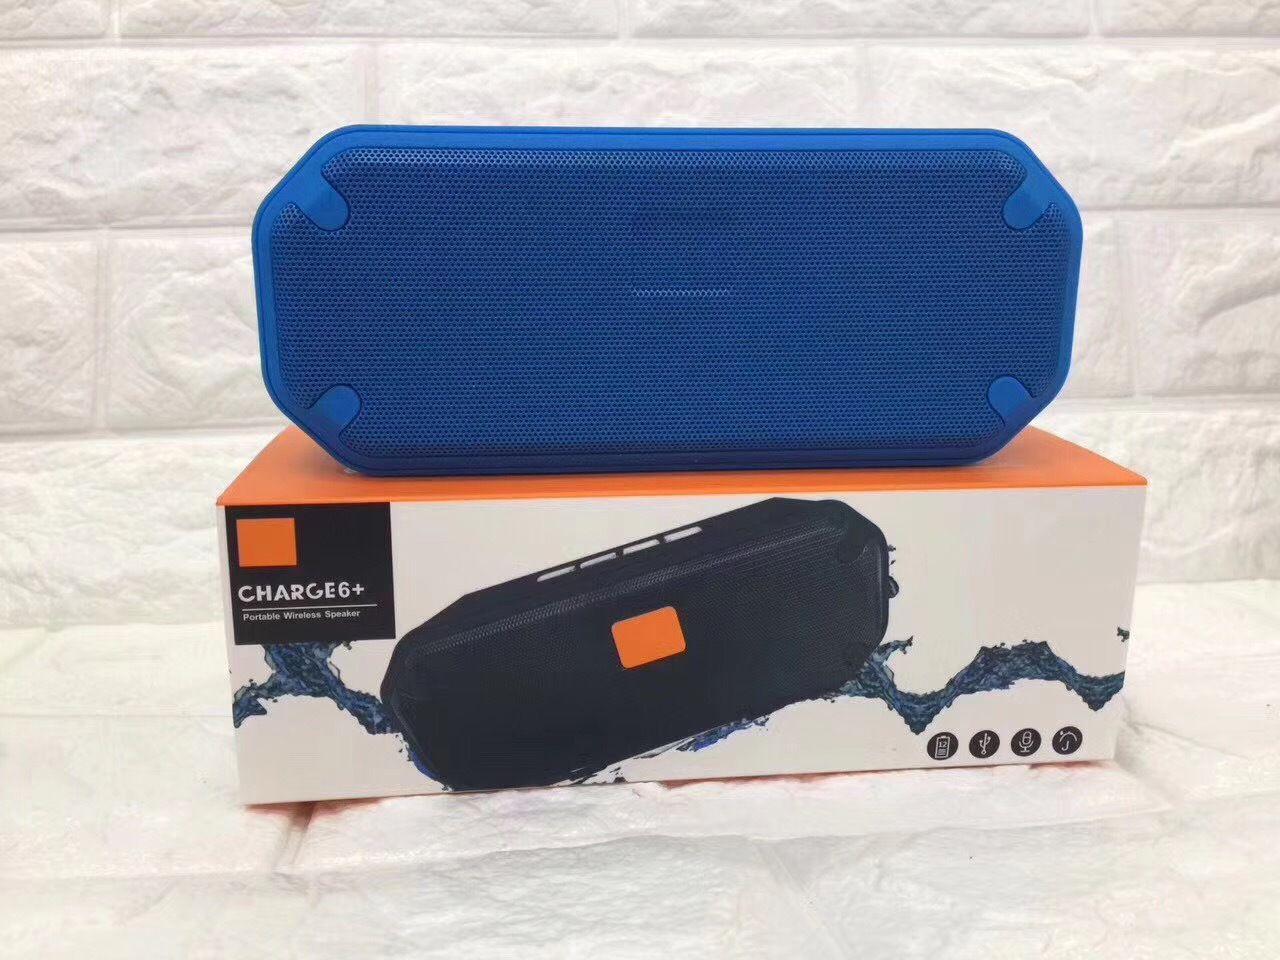 Official charge6 mini wireless Bluetooth speaker subwoofer waterproof desktop gift Bluetooth speaker pk charge4 clip2 flip3